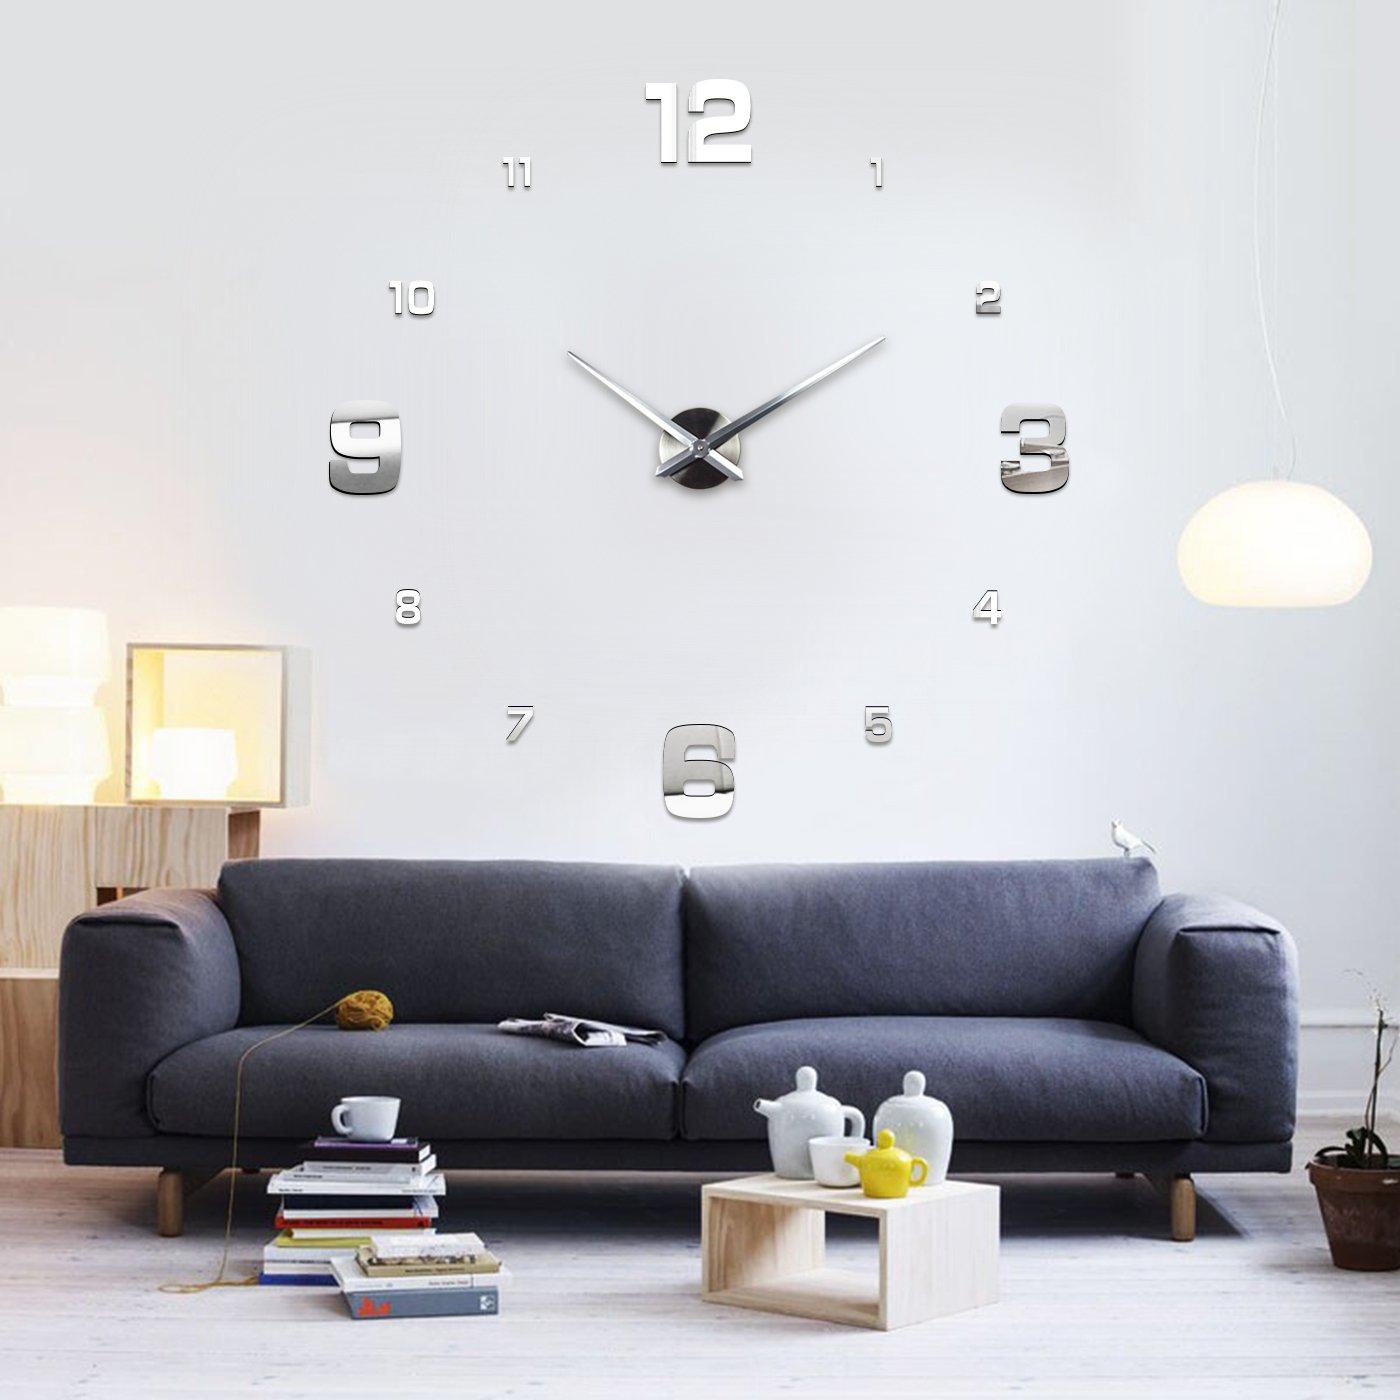 XXL3D Riesige 3D Wanduhr Vinyl DIY Ø 130cm Große XXL Spiegel Uhr V ...